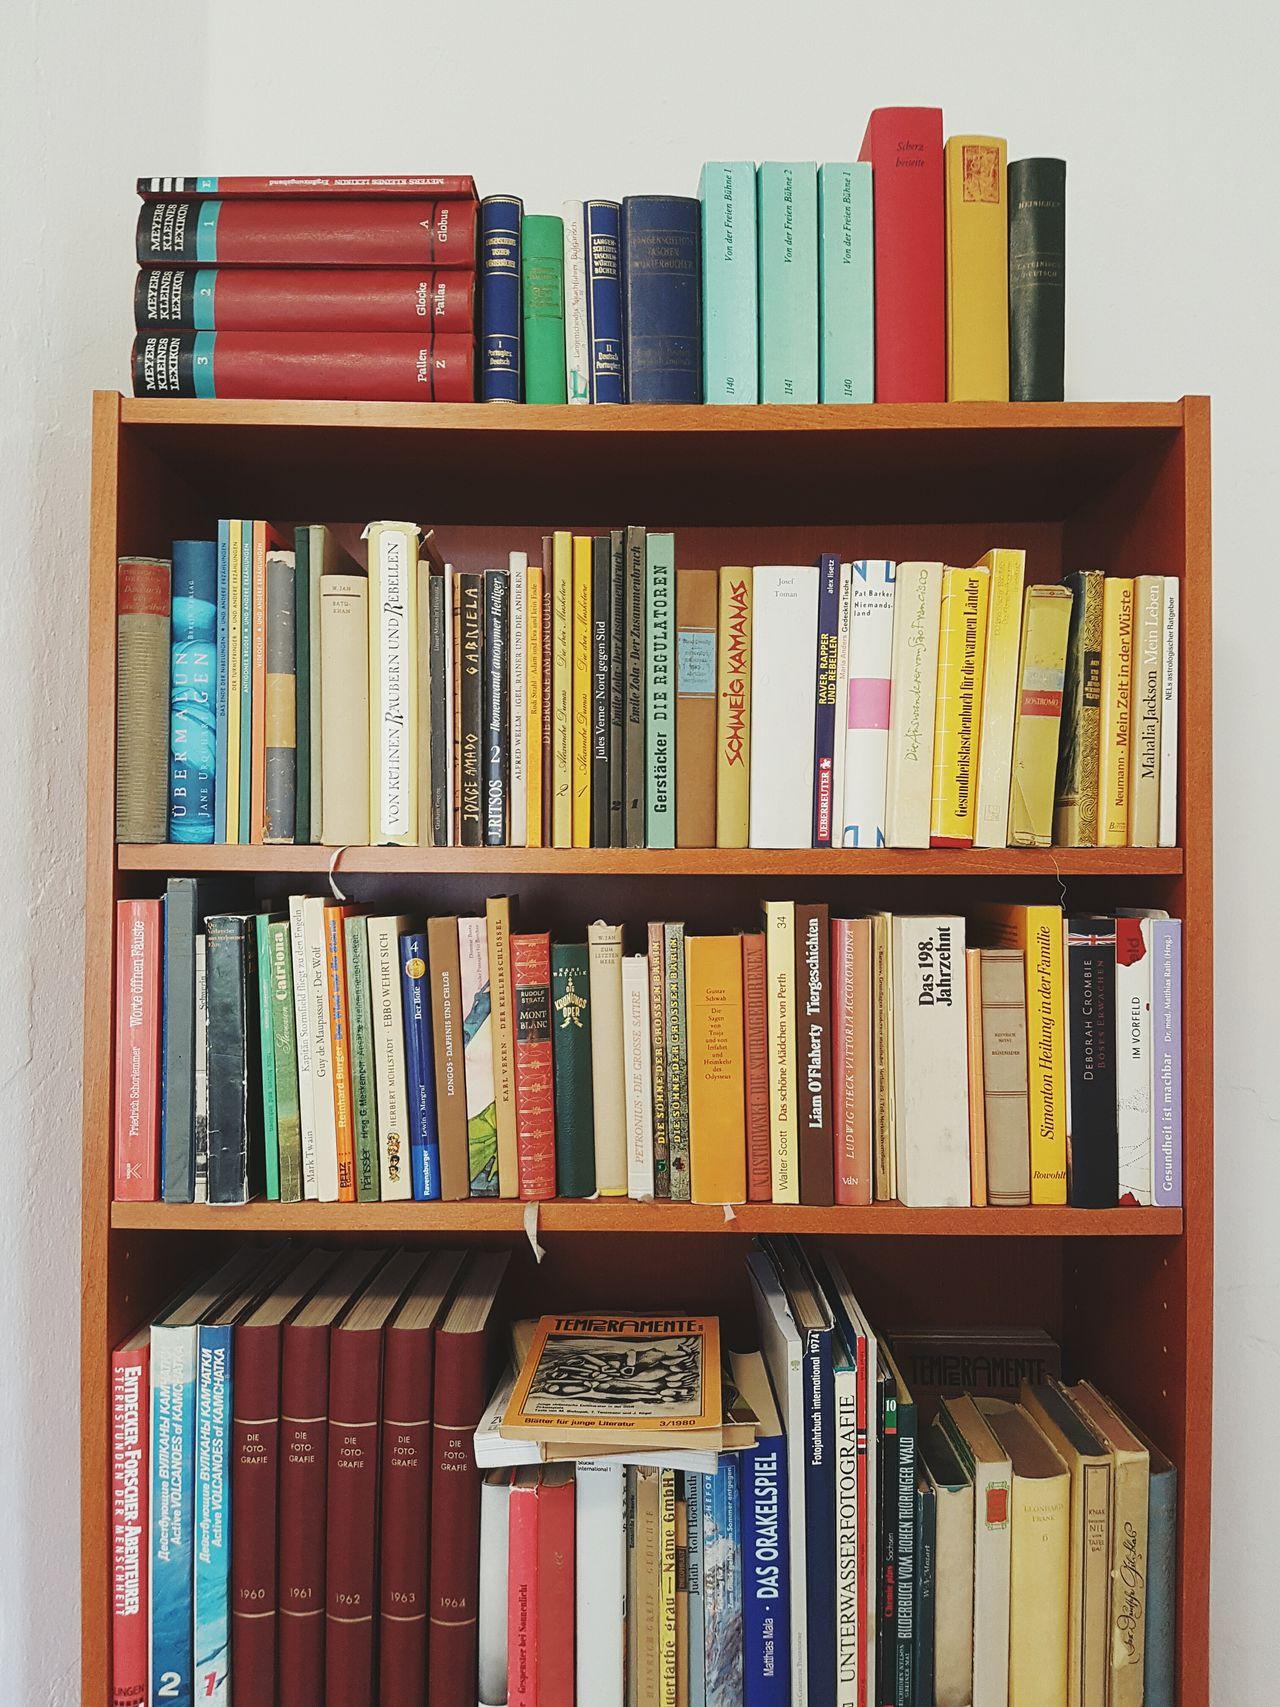 Booksbooksbooks TheWeekOnEyeEM Instagood BooksLove Books To Read Bookstagram Books Ordnung Muss Sein Ordnung Regal & Righteous. Correct Neat Photooftheday